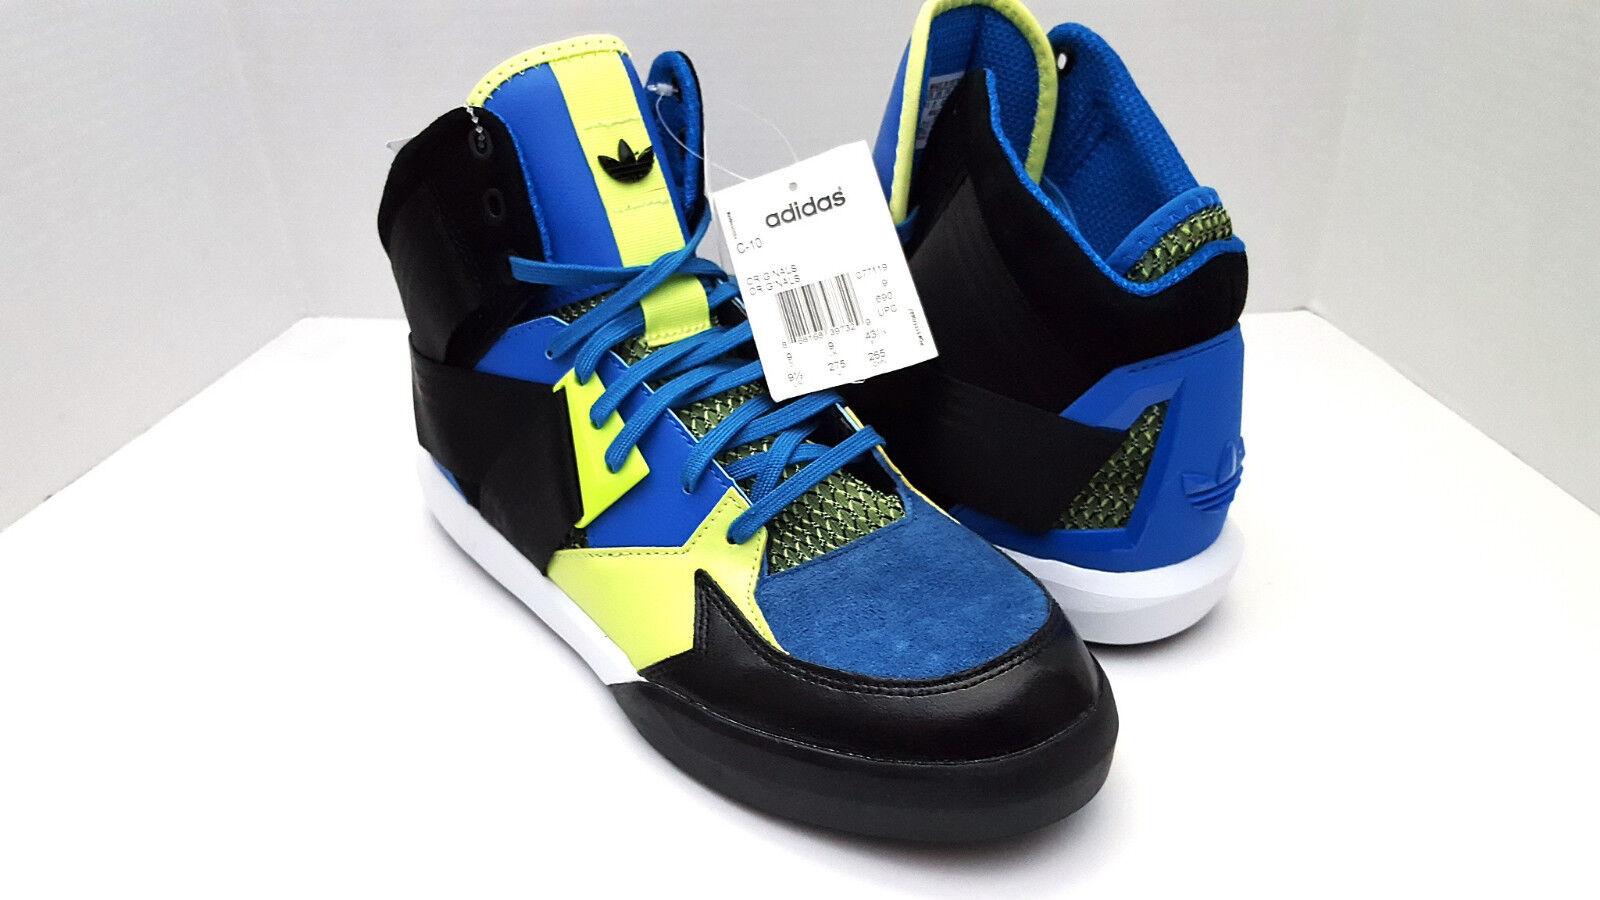 Adidas Originals C-10 Men's Basketball   Sneakers Shoes  Size: 9.5(M) US